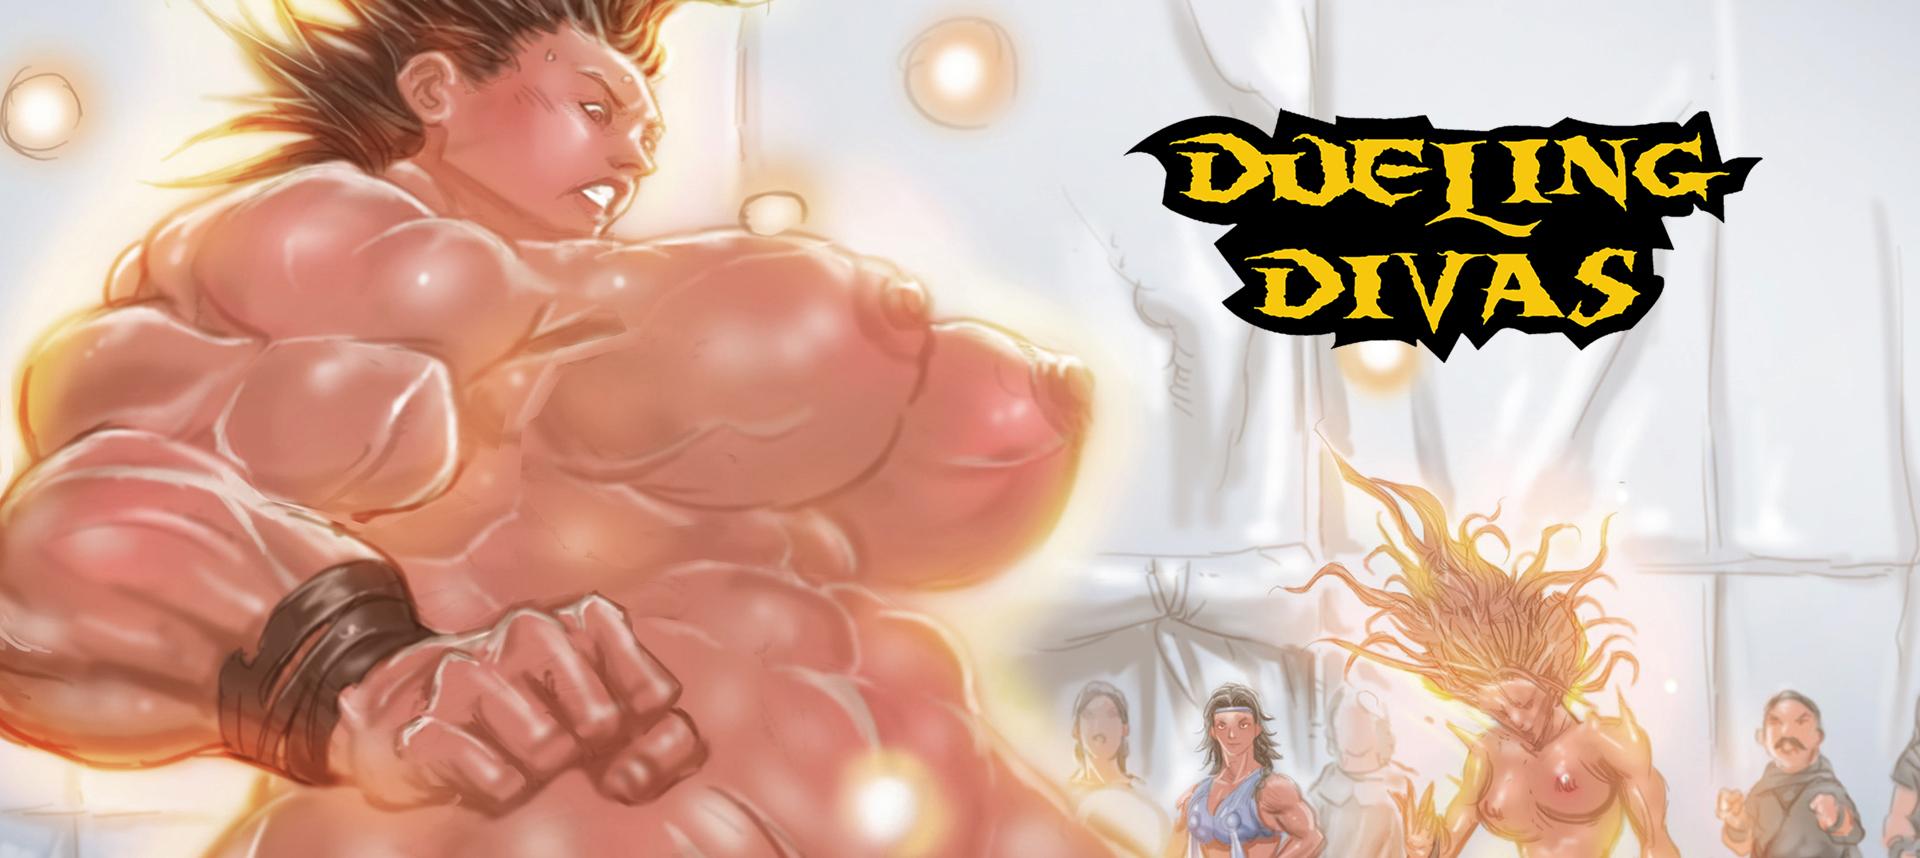 Dueling-Divas_02-SLIDE